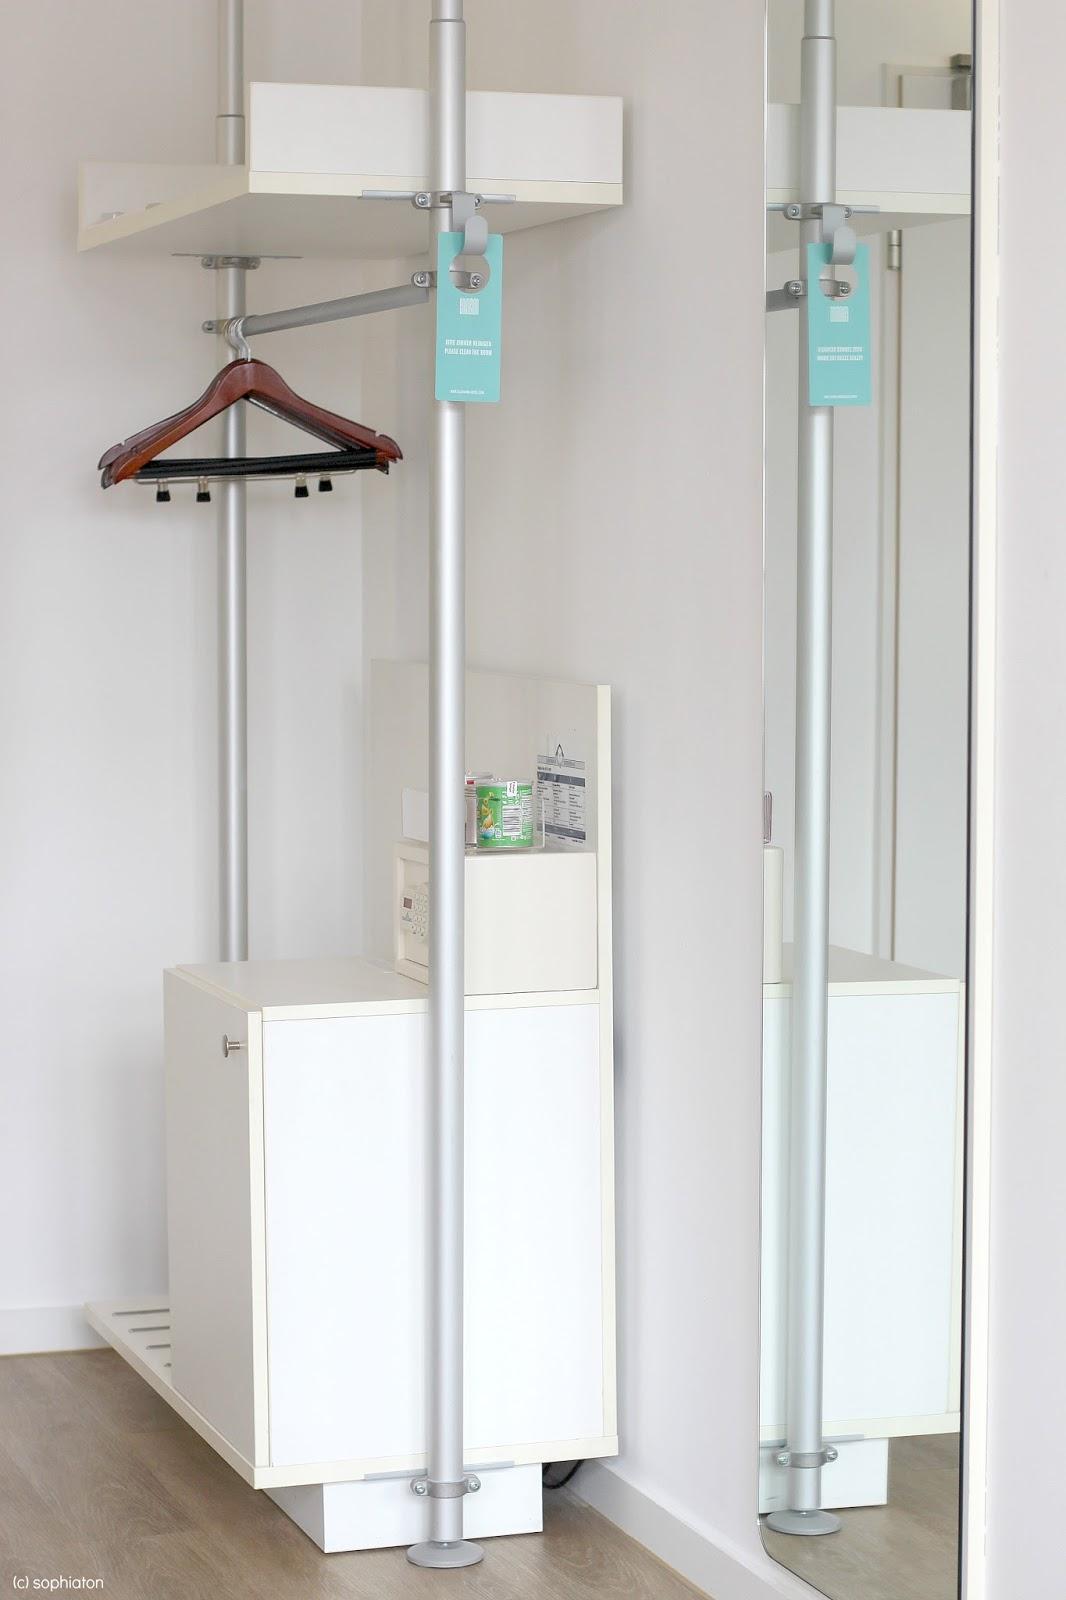 Rooms: Berlin » Sophia Ton